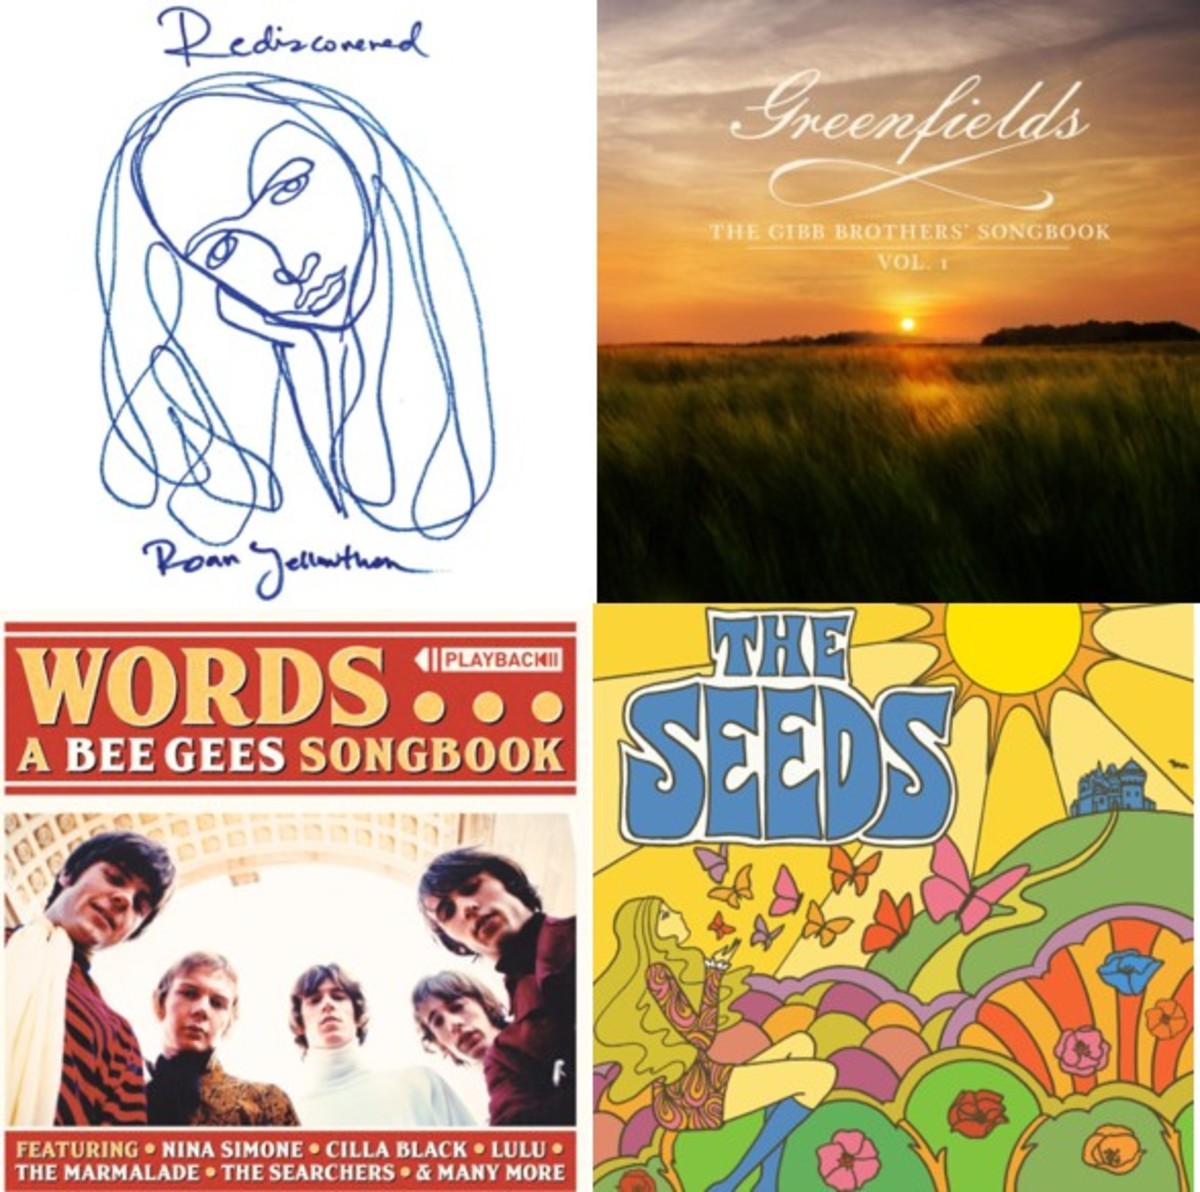 Roan 4 albums